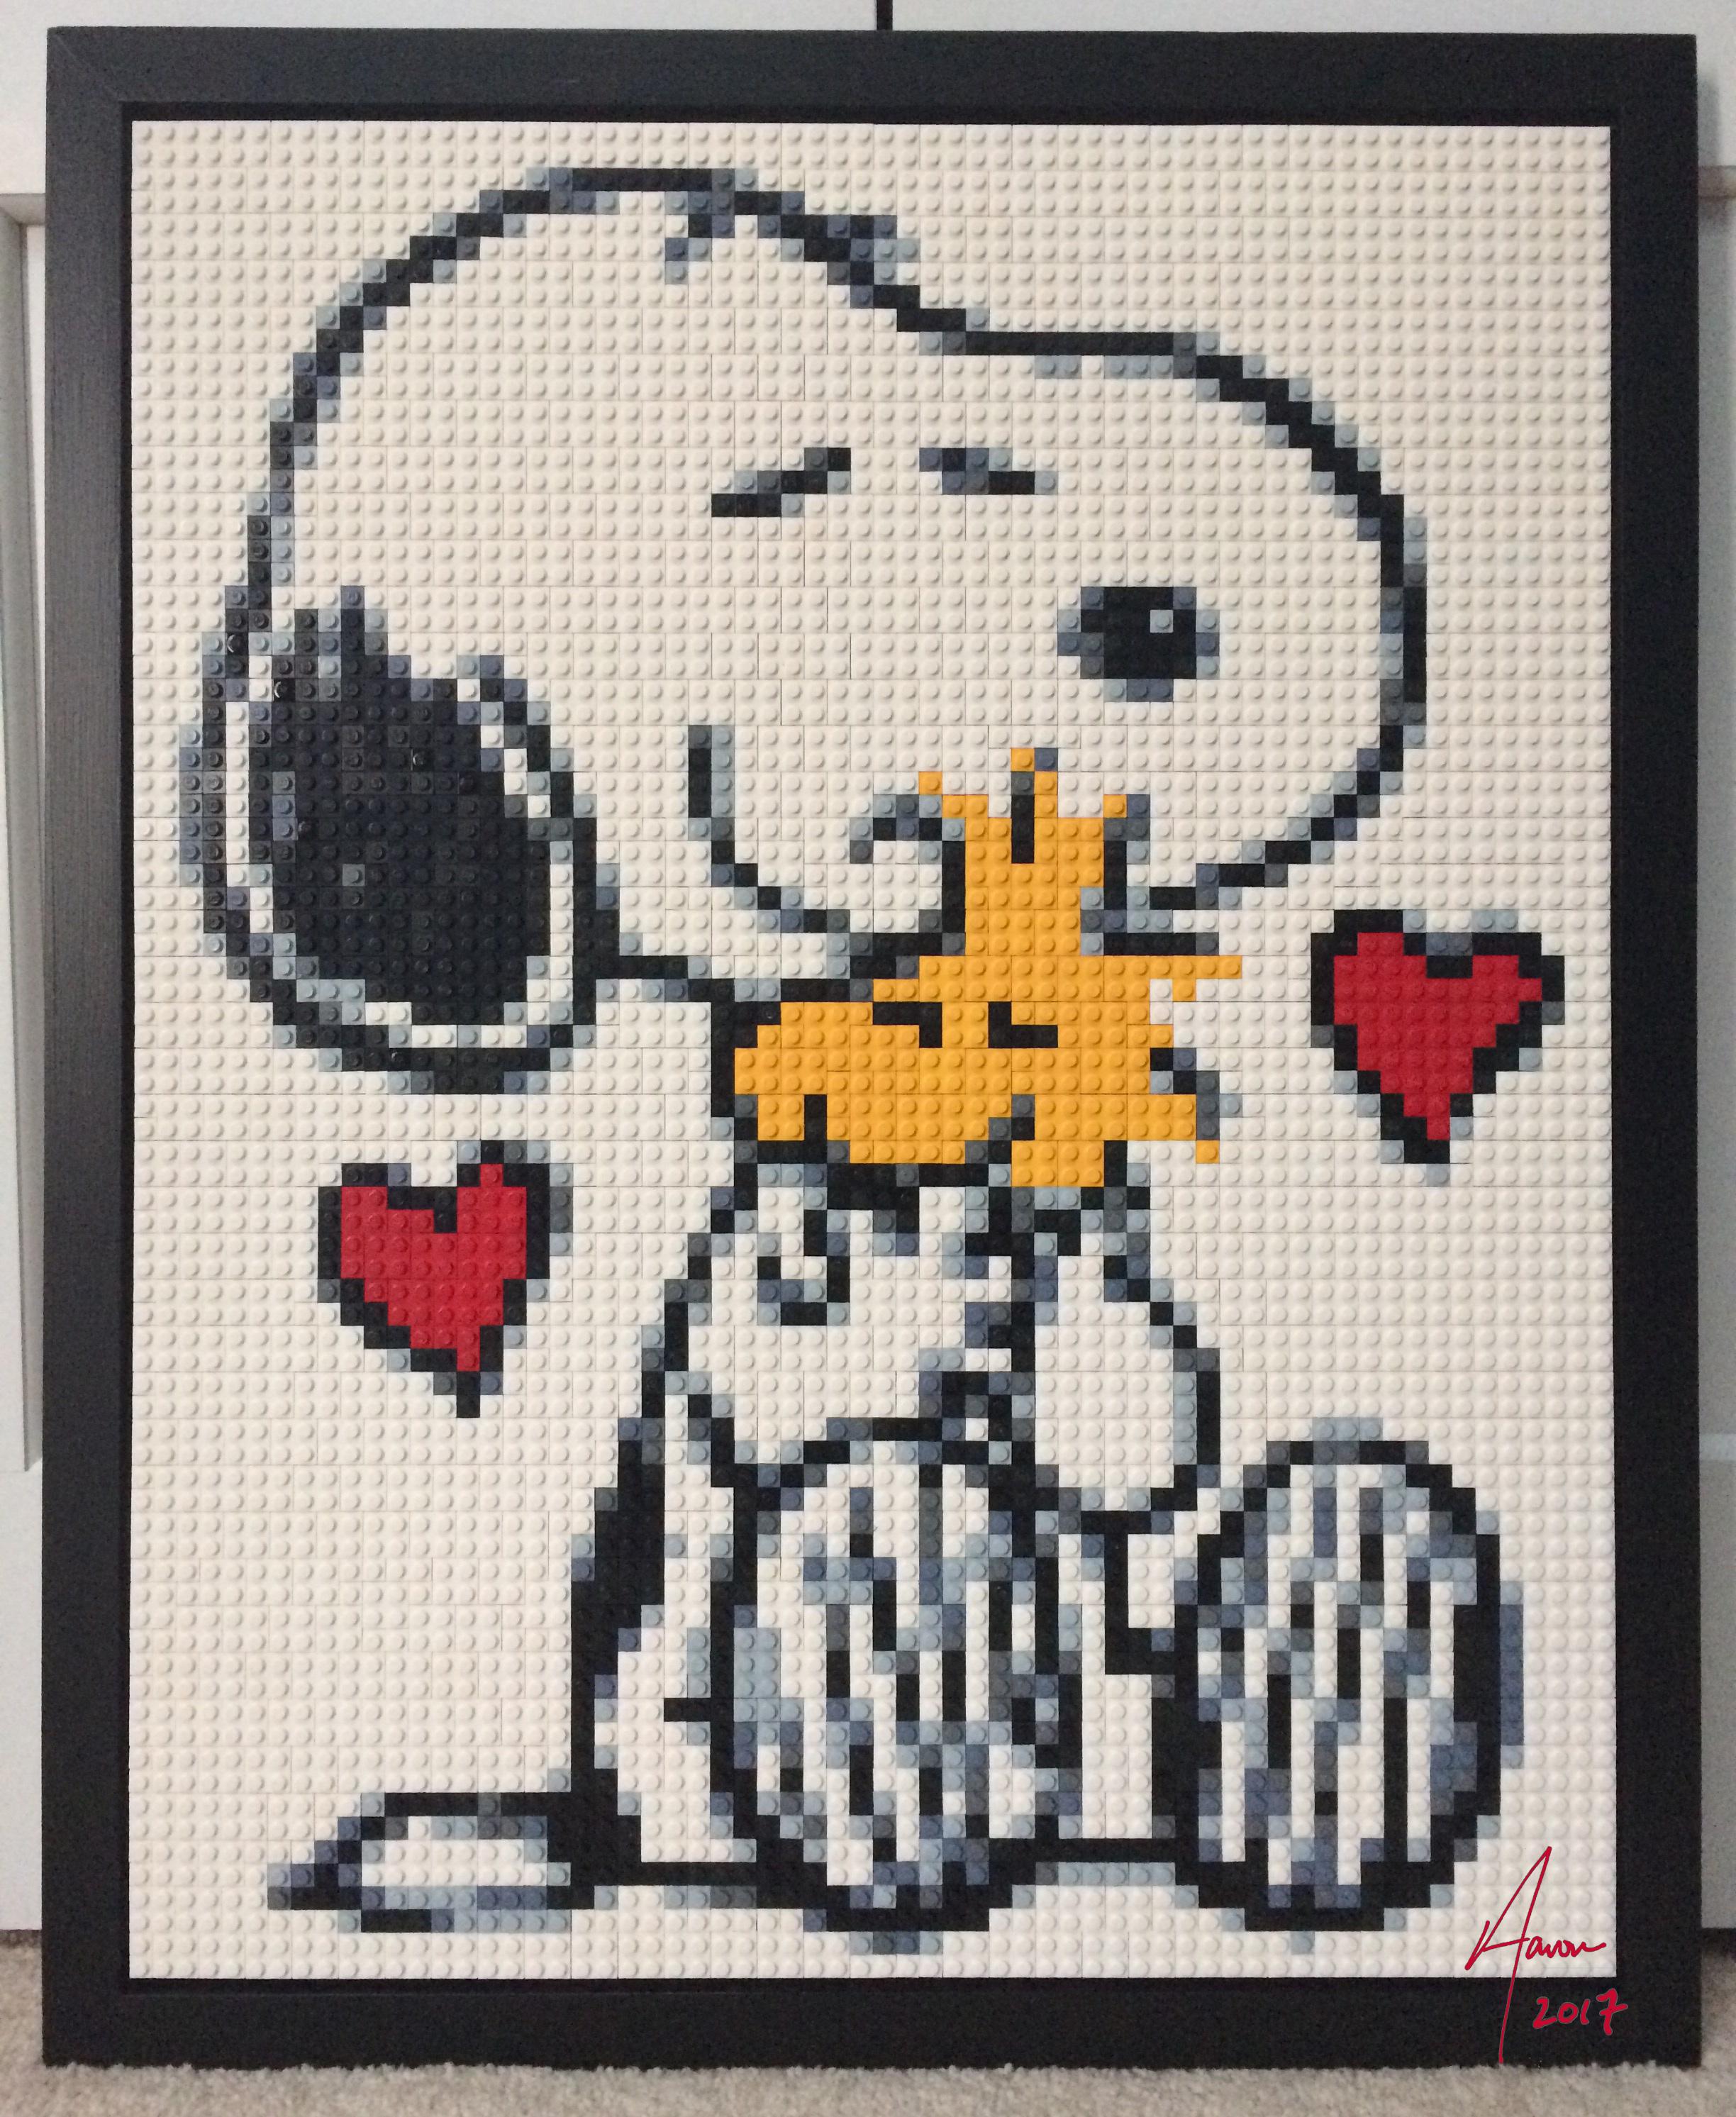 Snoopy & Woodstock LEGO mosaic